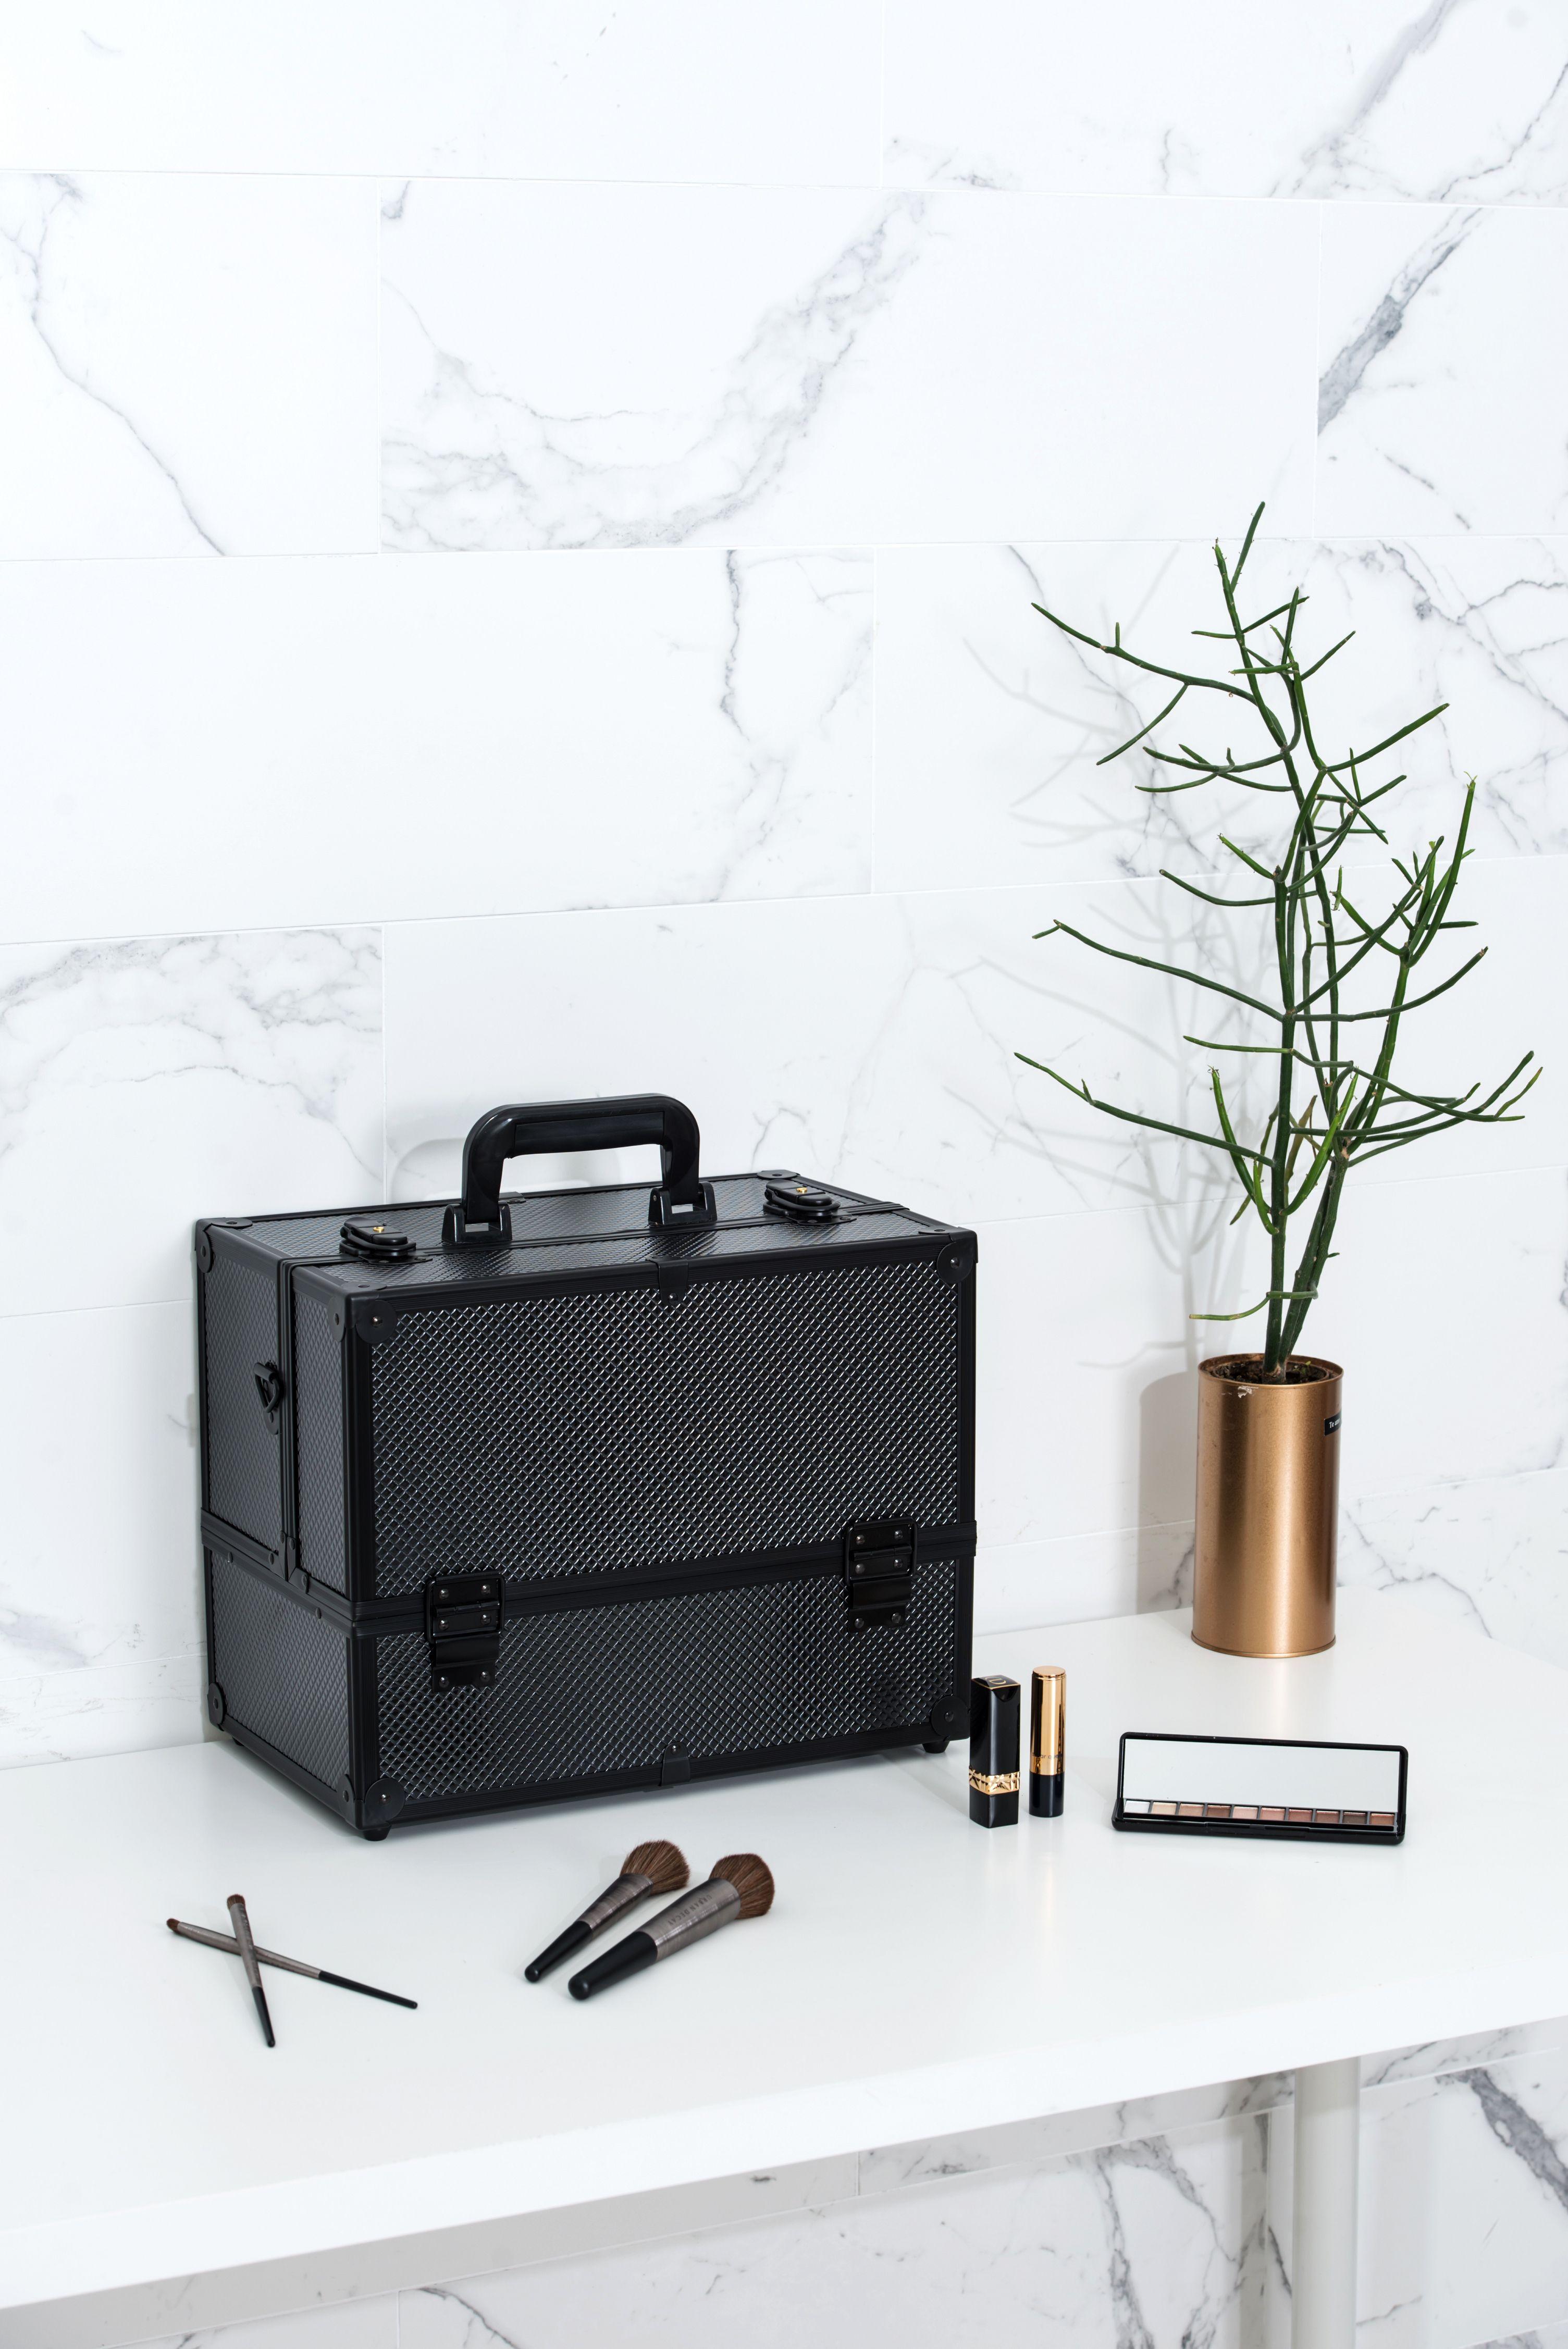 97ded1d0b743 Black Diamond Professional Makeup Train Case Large Storage Cosmetic ...